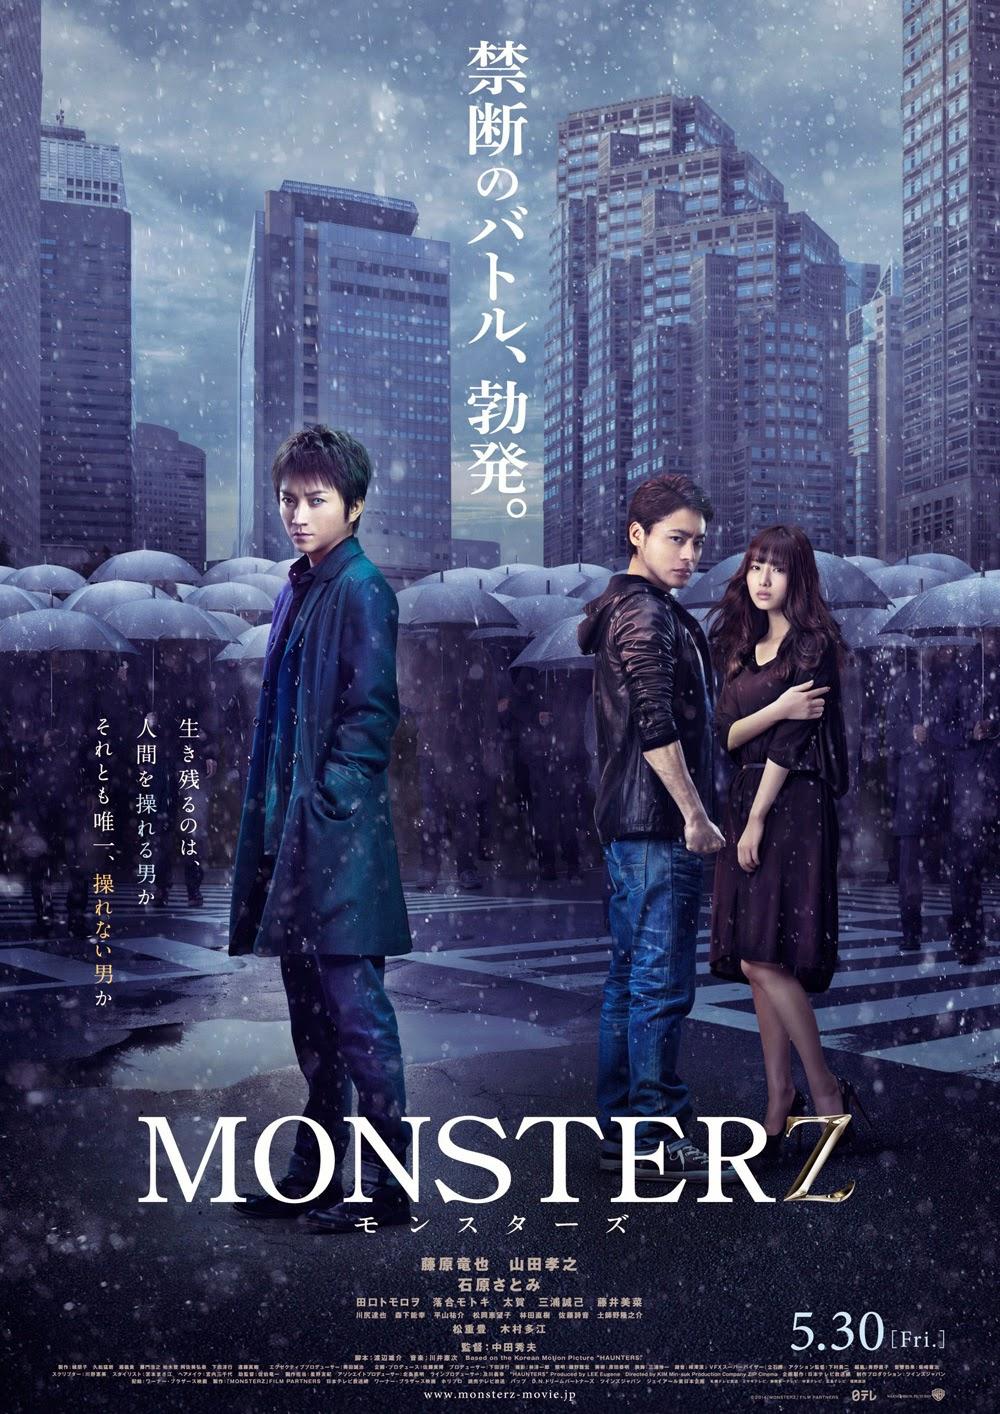 Monsterz (2014) DVDRip ταινιες online seires xrysoi greek subs